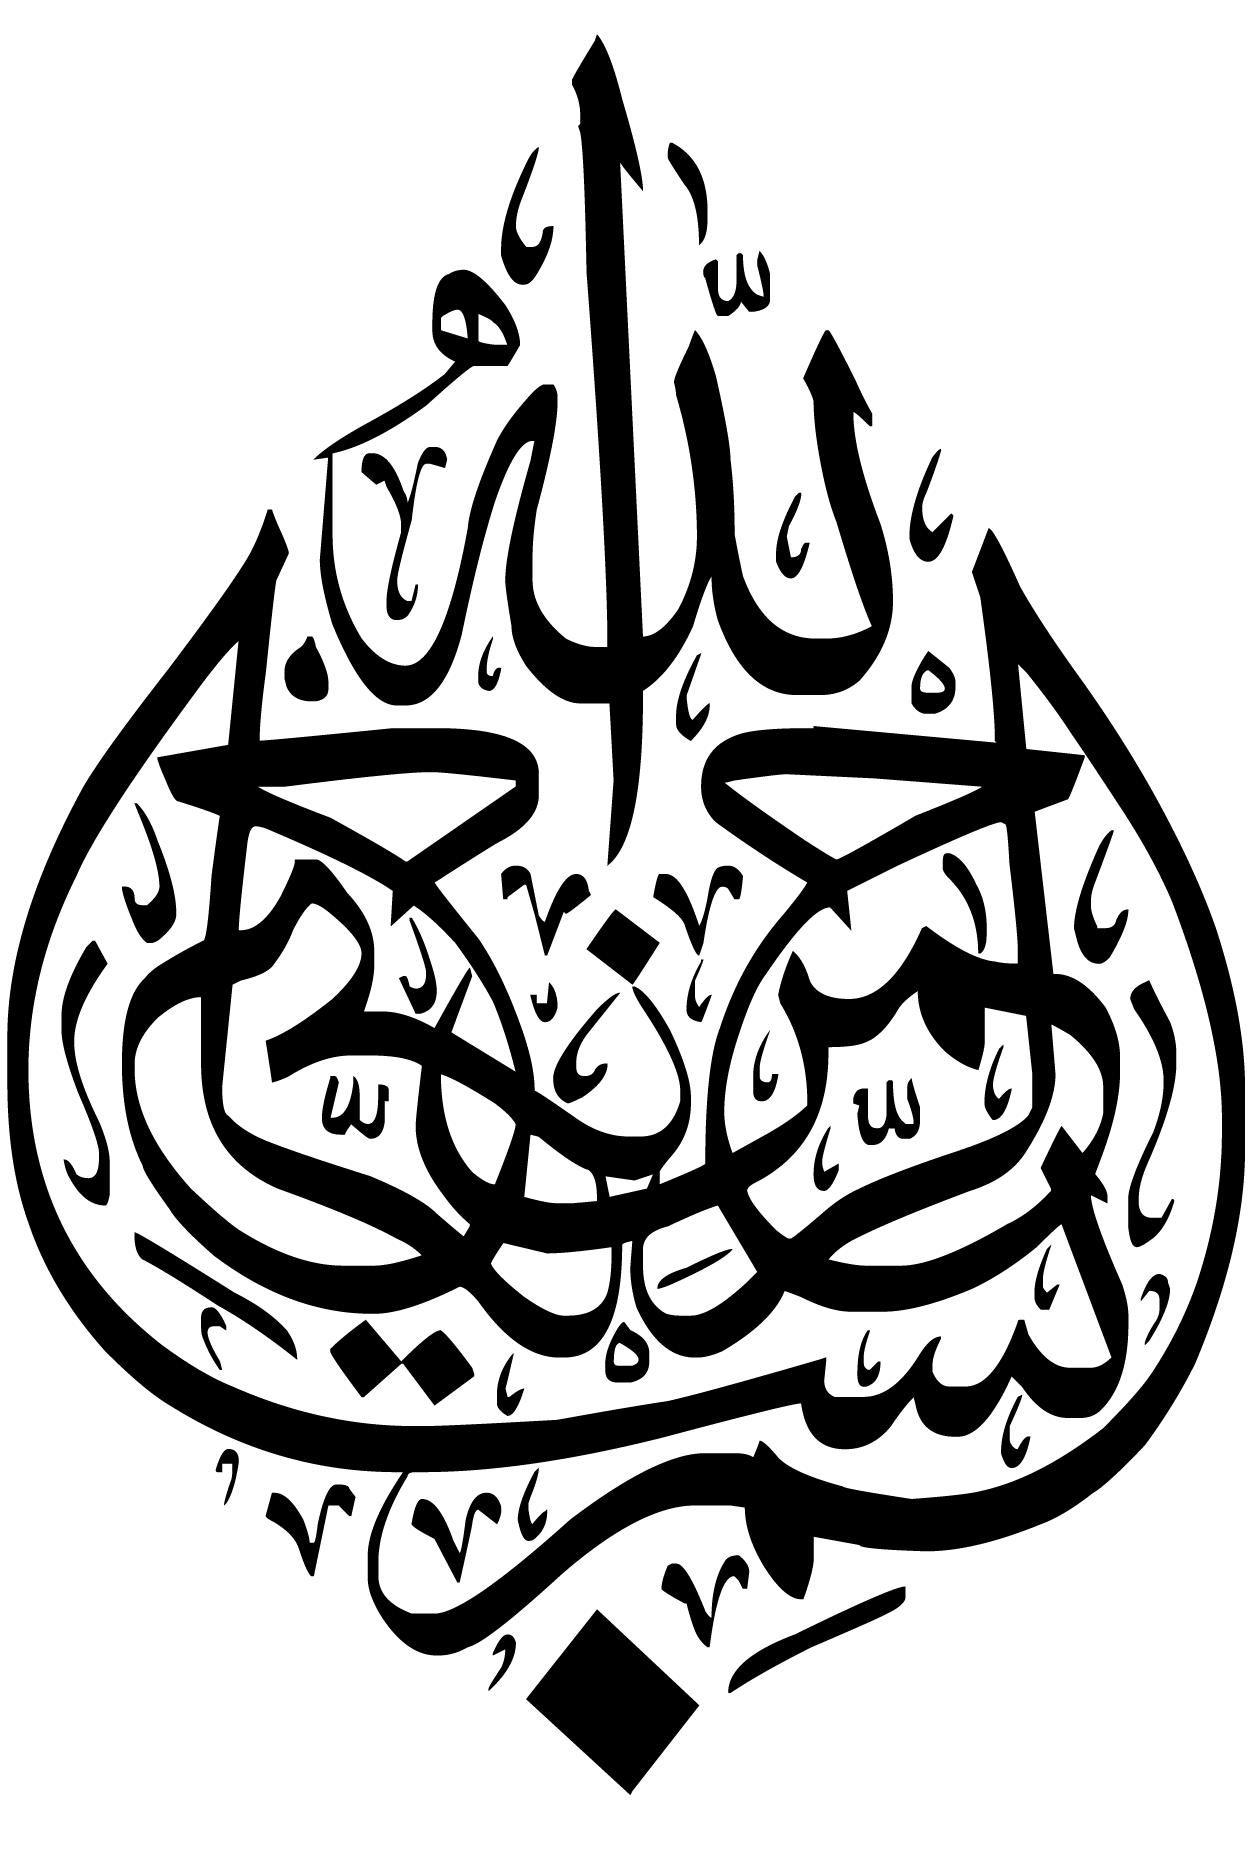 calligraphy | Kuran | Pinterest | Letras arabes, Diseño árabe y Letras